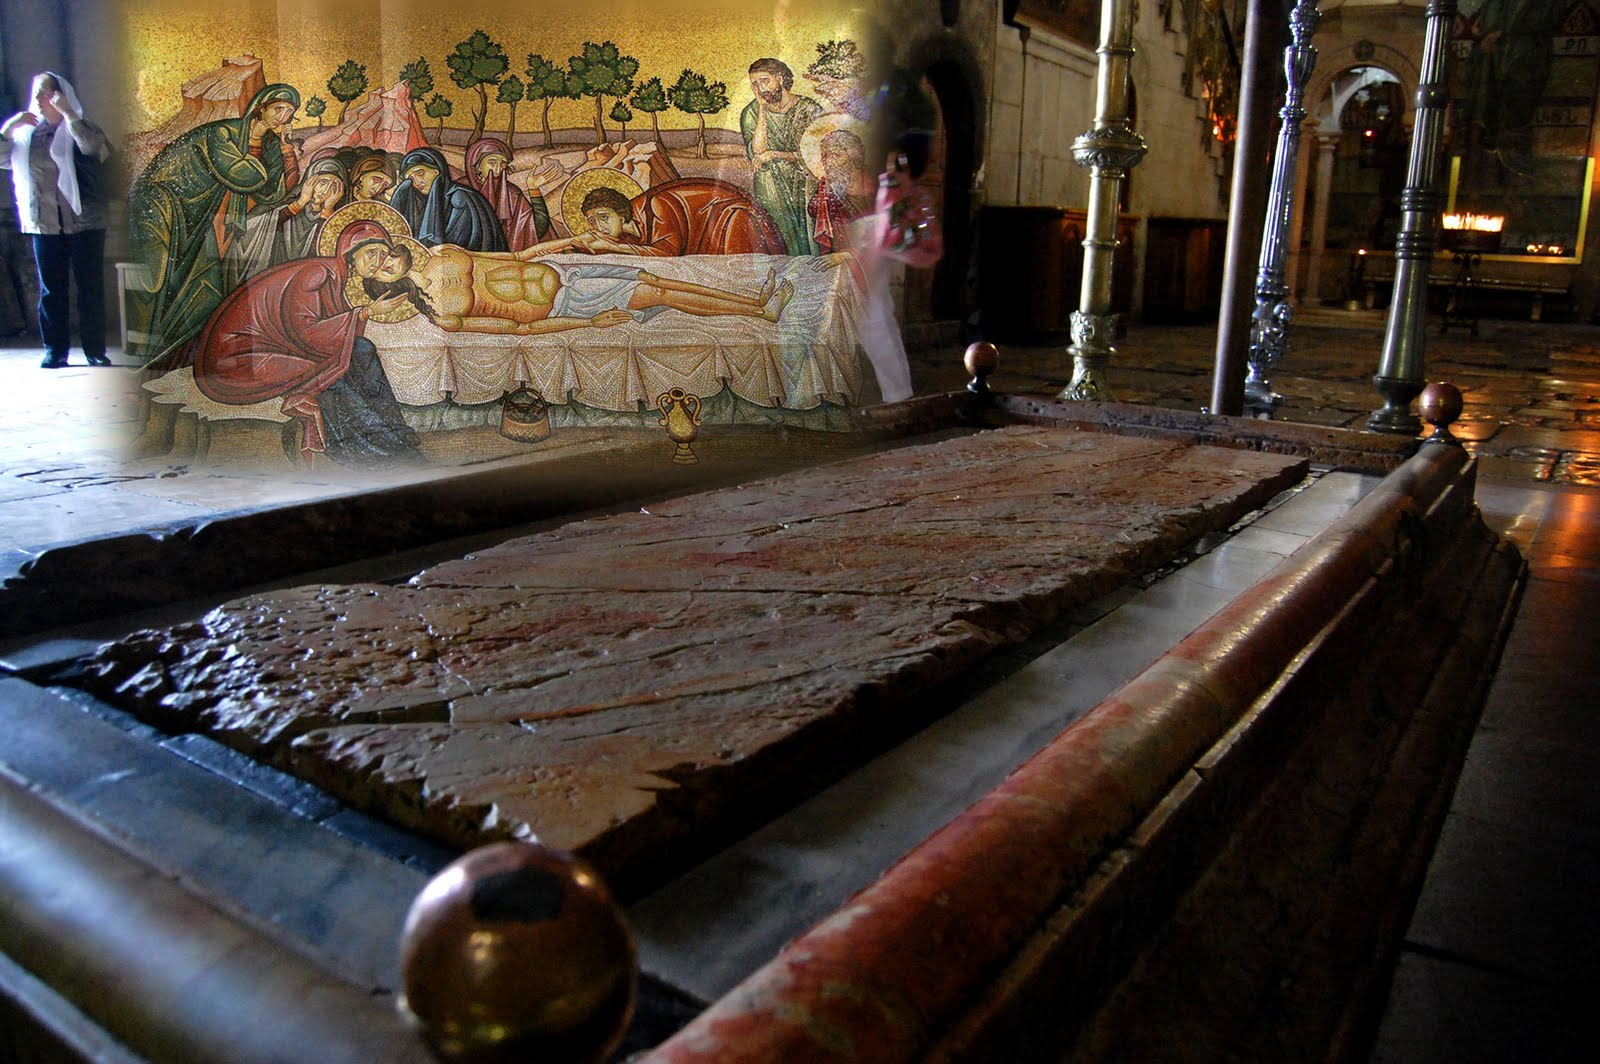 Peregrinos en tierra santa dia 5 jerusal m v a dolorosa for Donde queda santa cruz